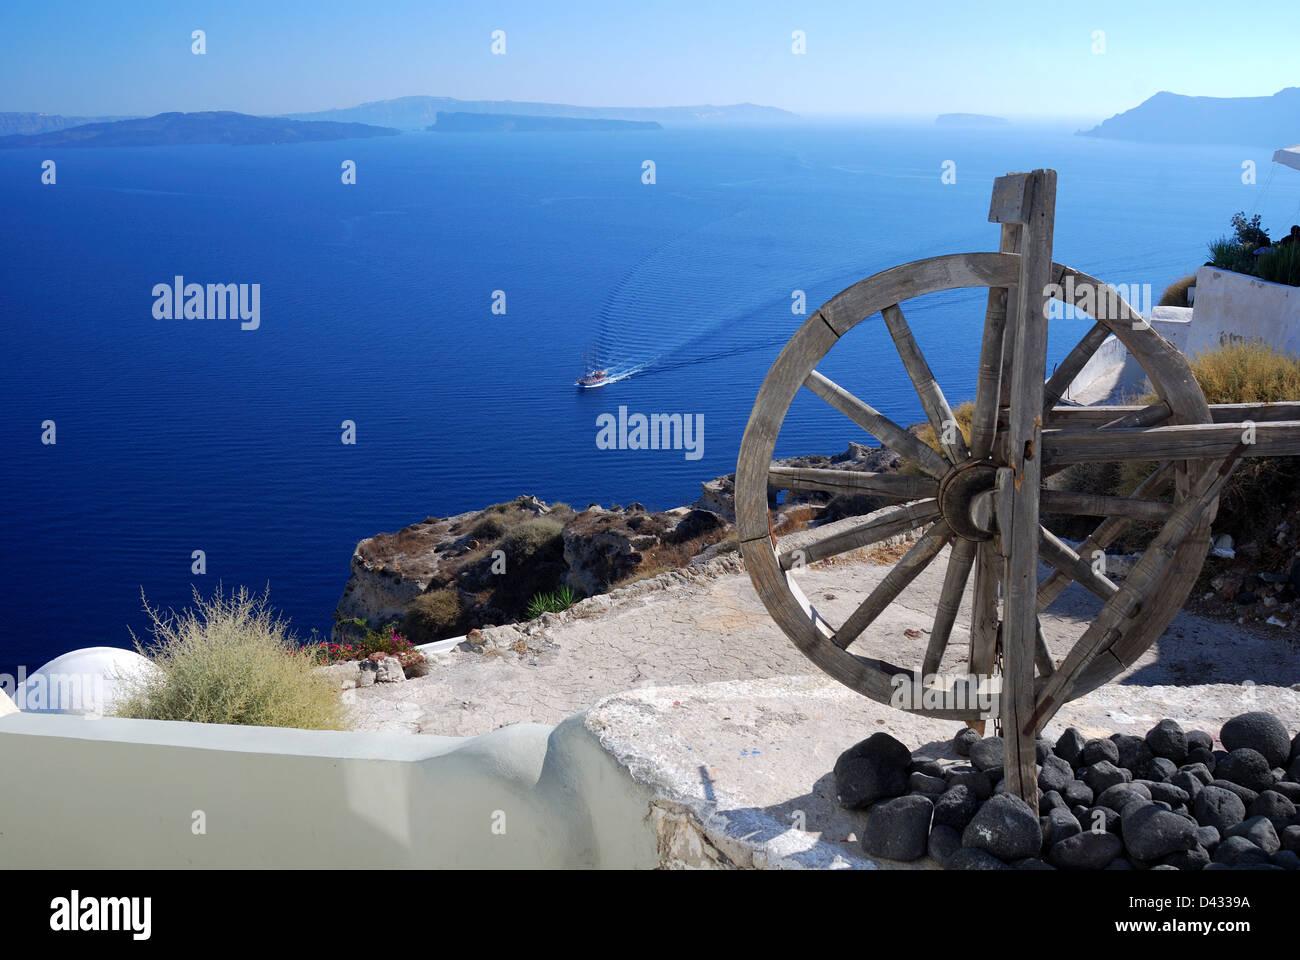 Landscape with caldera from Oia village, Santorini - Stock Image